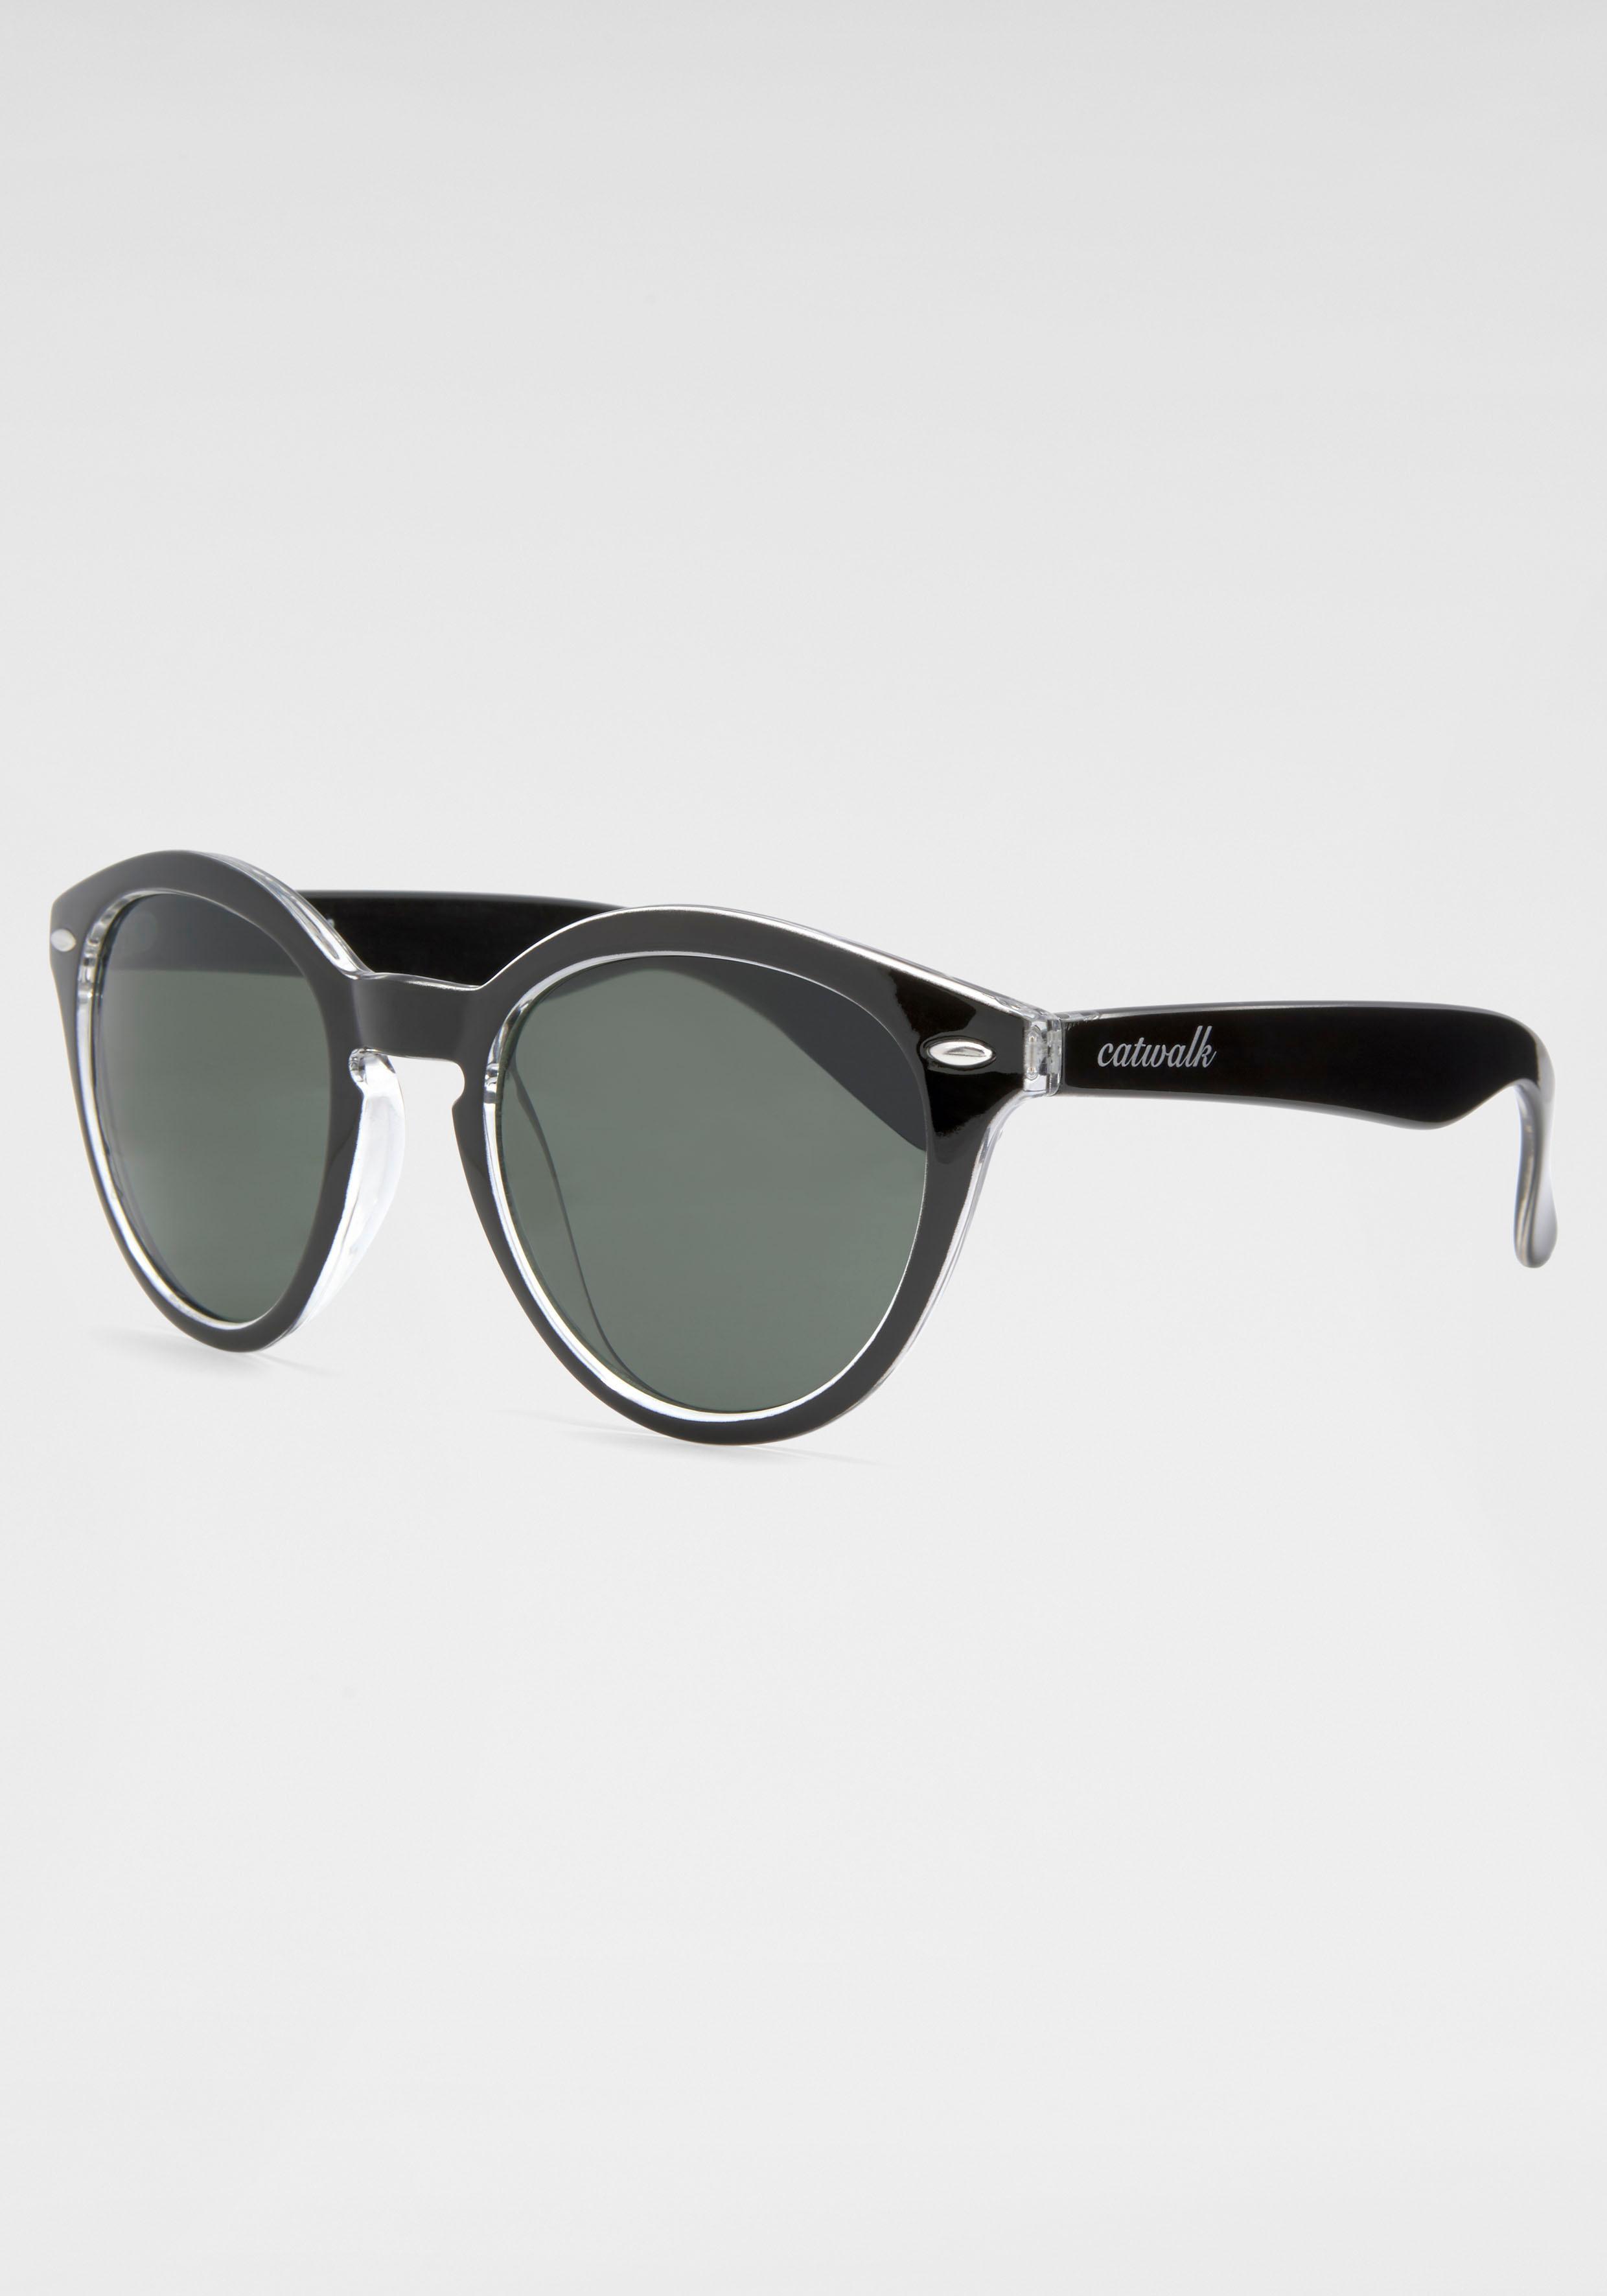 catwalk Eyewear Retrosonnenbrille | Accessoires > Sonnenbrillen | Schwarz | Catwalk Eyewear